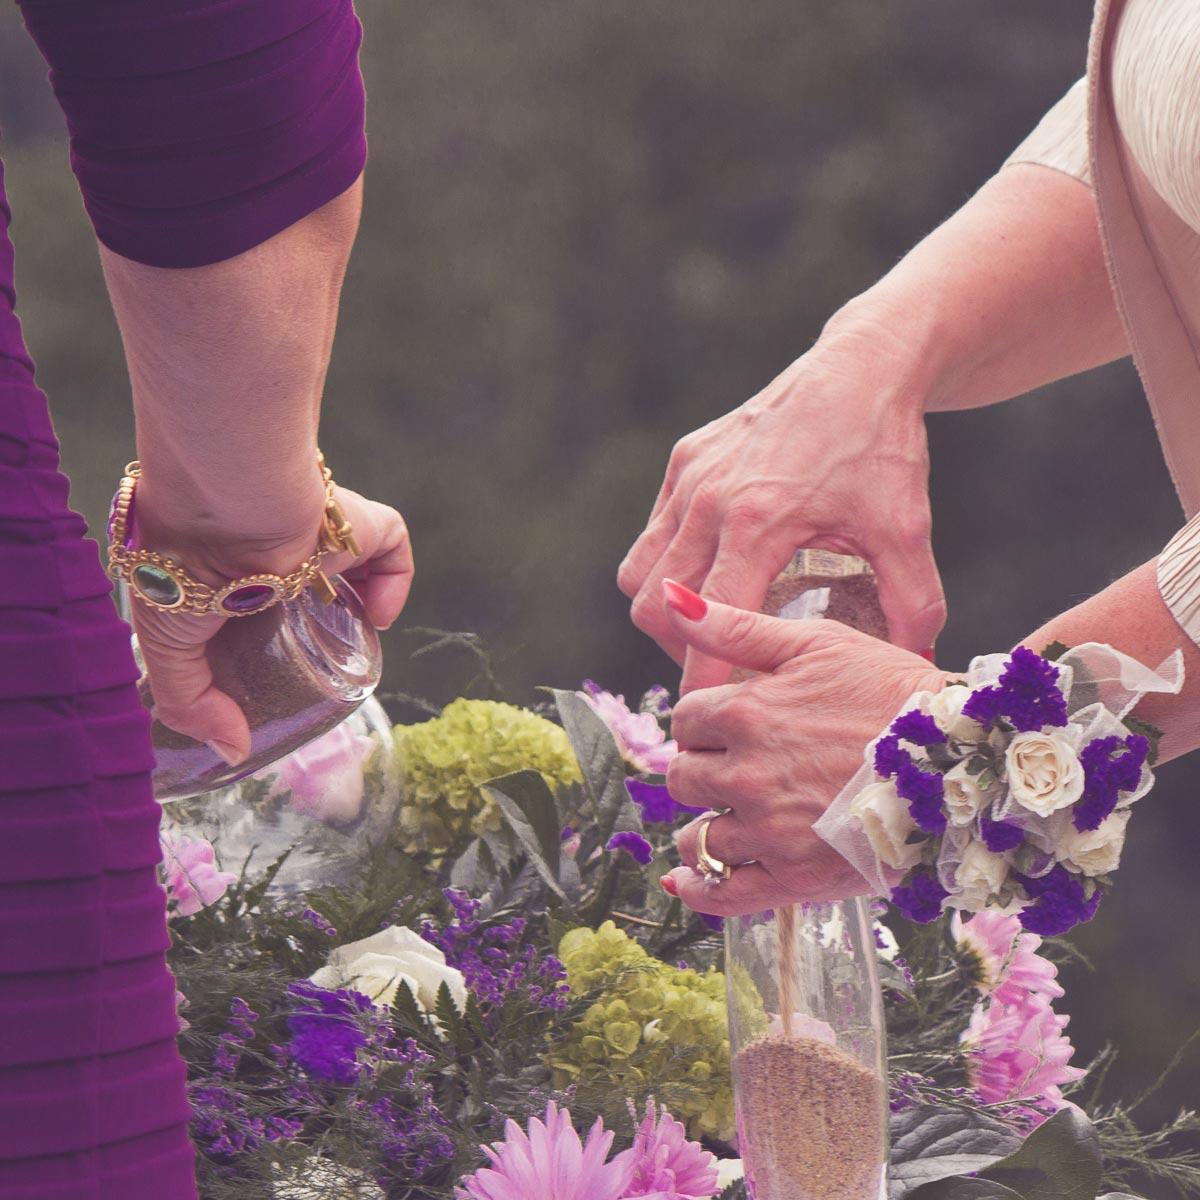 evansville-wedding-photographer-pabst-photo-kokies-echo-valley-(70)